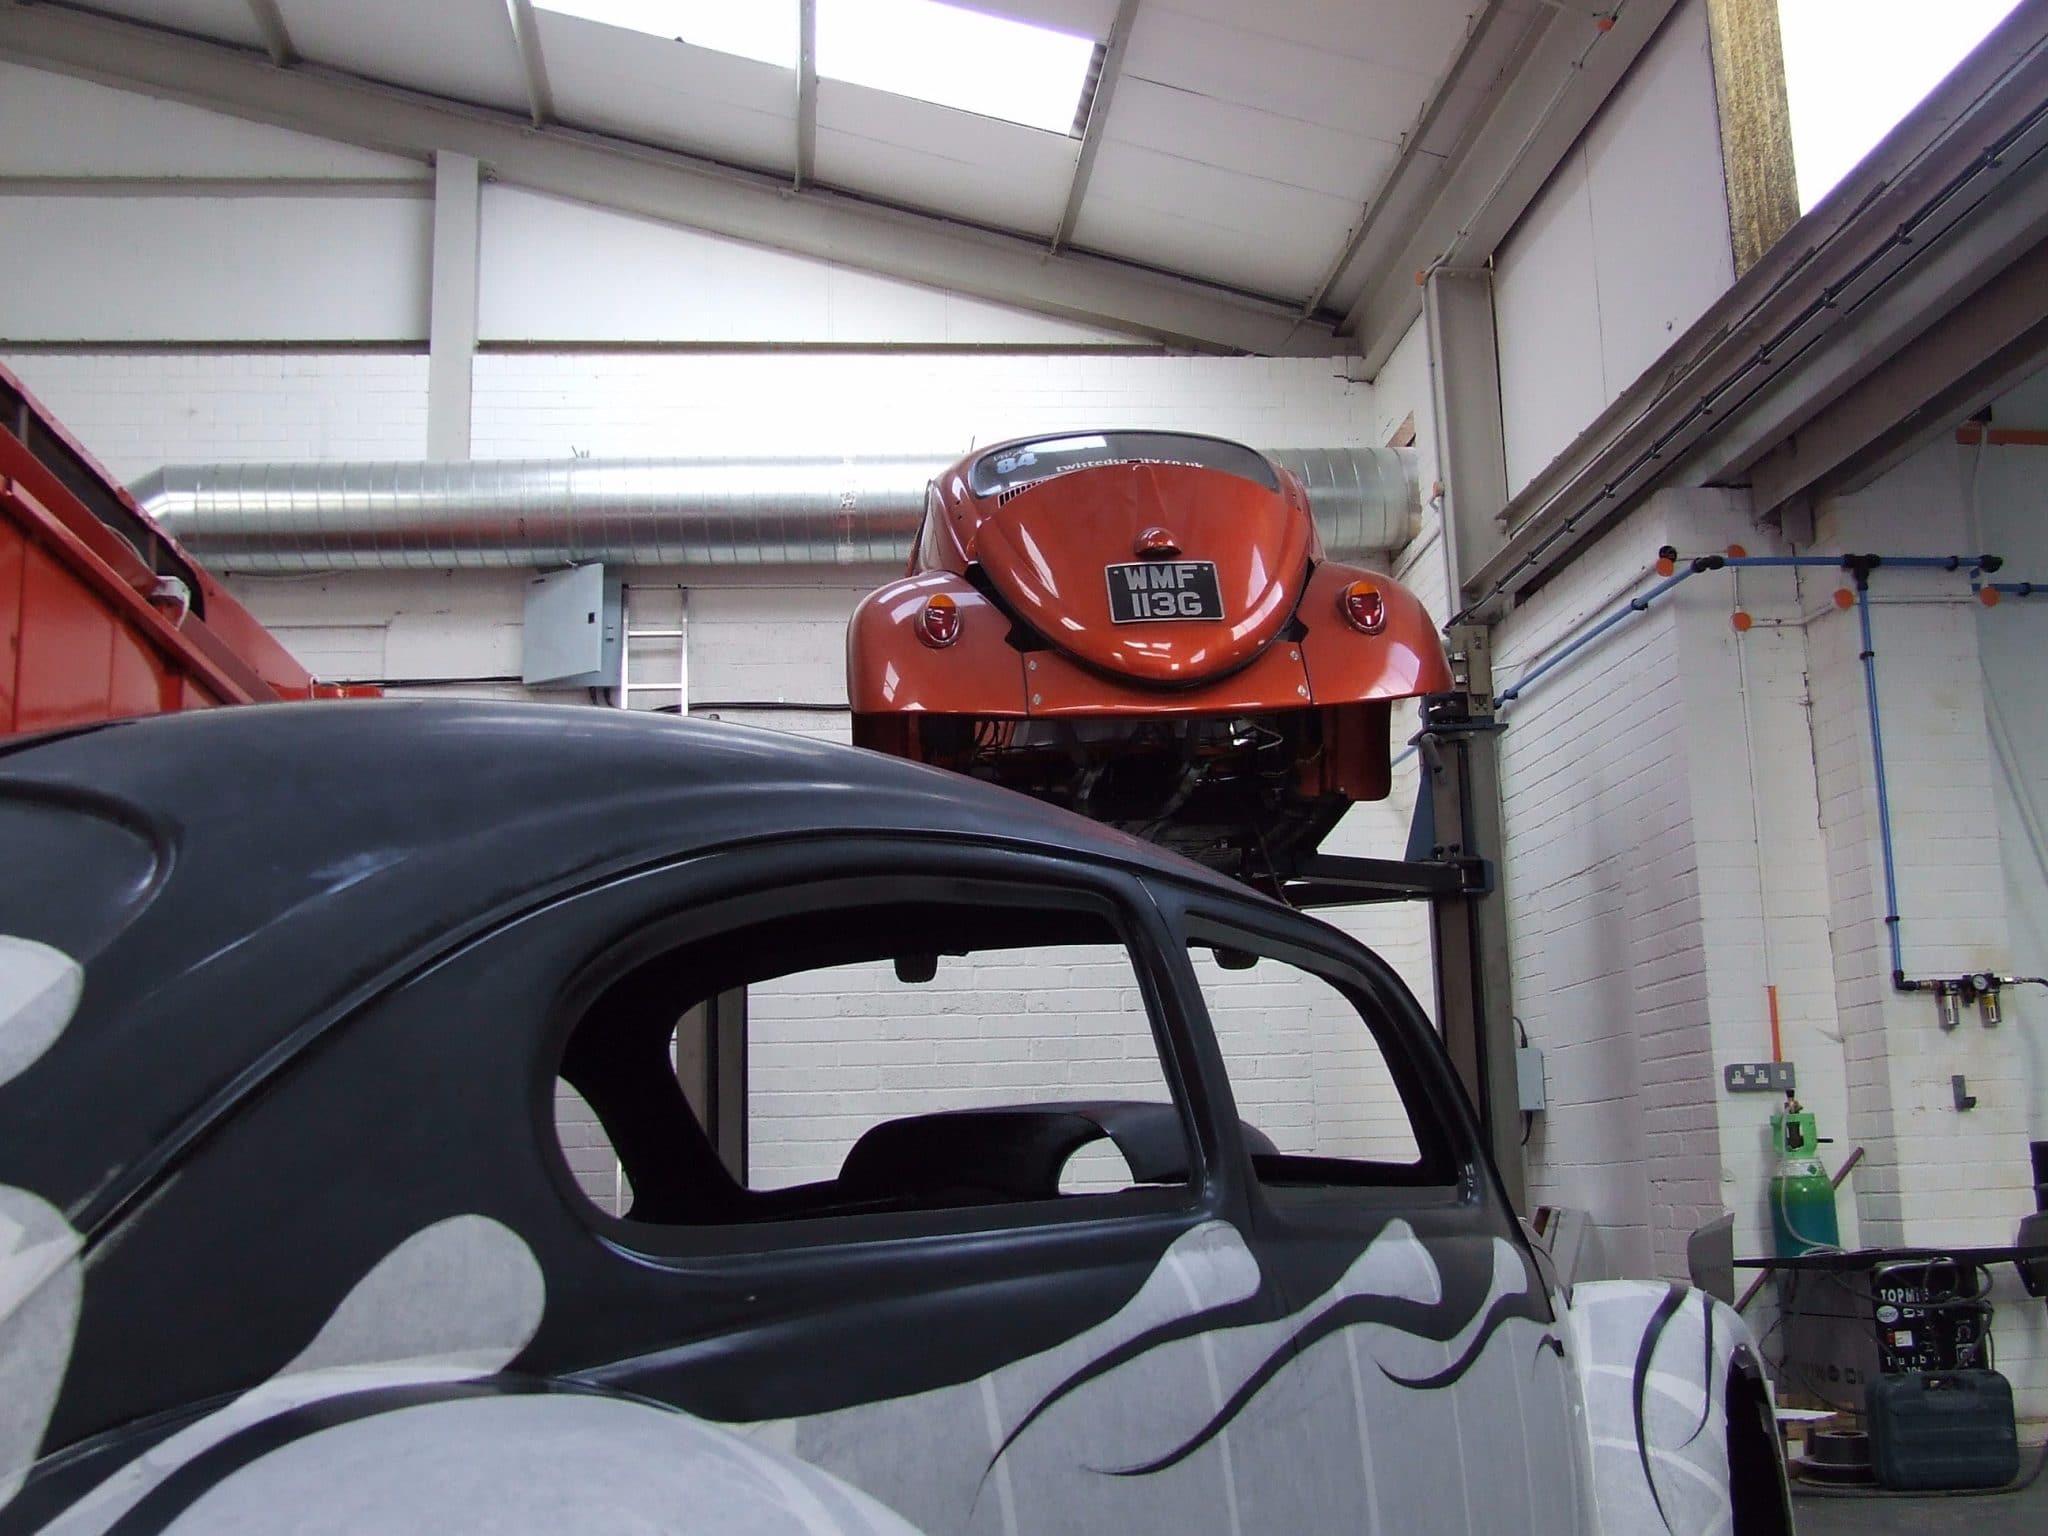 Beetle restoration - orange on ramp black and white on ground